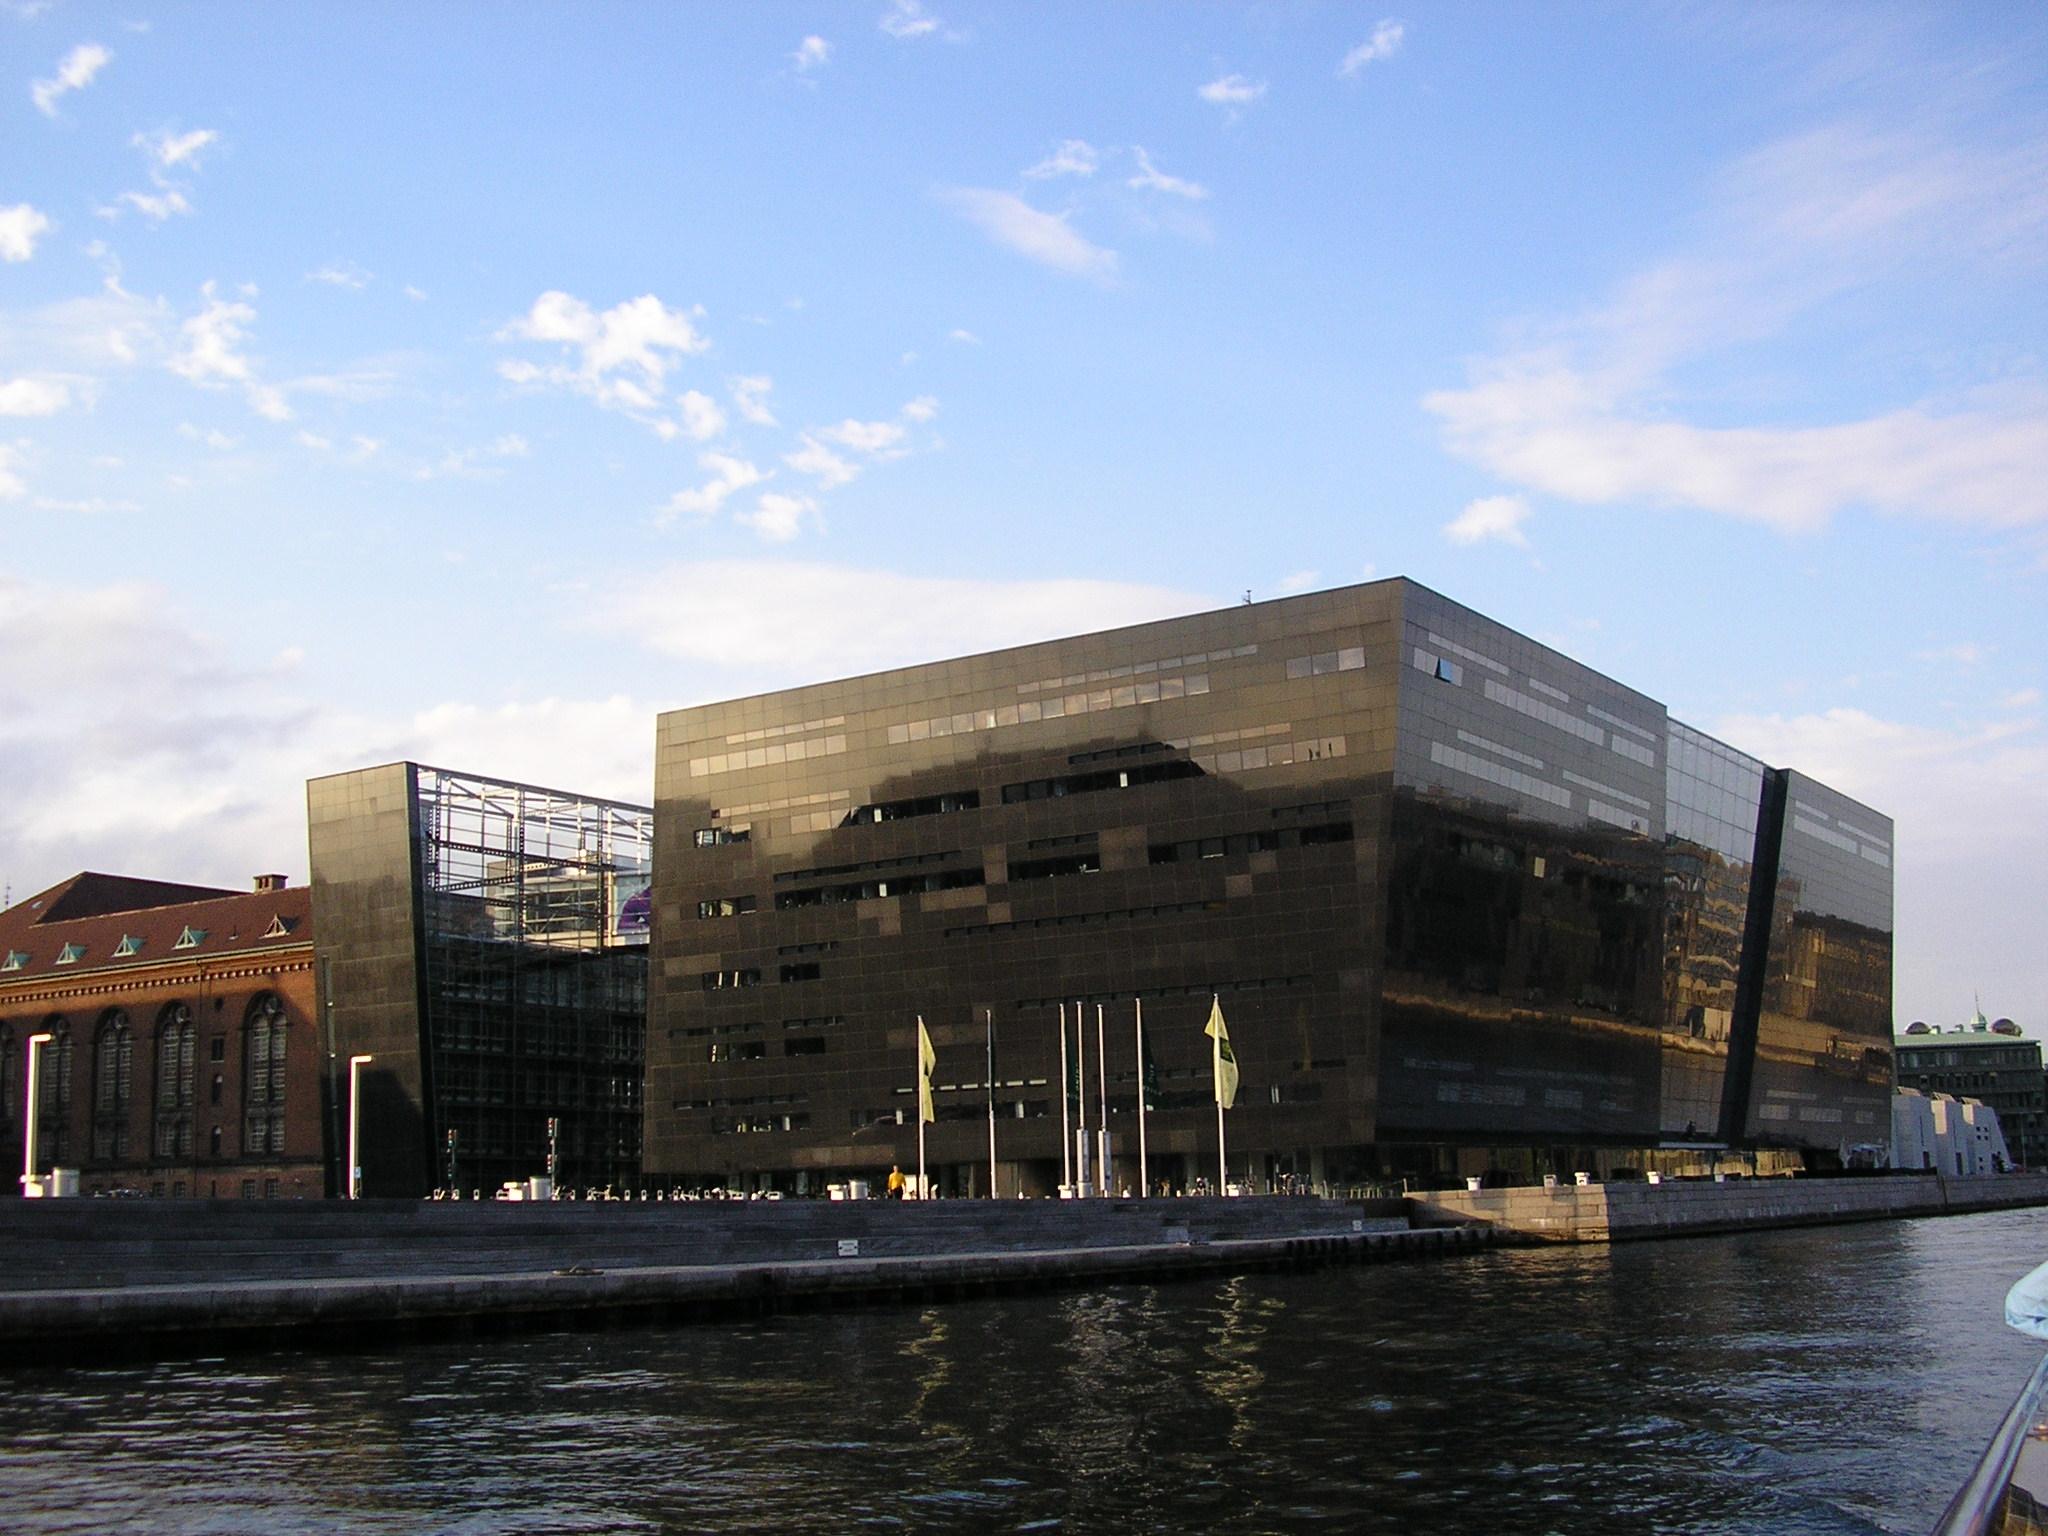 Dating Royal Κοπεγχάγη Δανία Τι είναι ένα καλό όνομα χρήστη για έναν άντρα σε μια ιστοσελίδα γνωριμιών